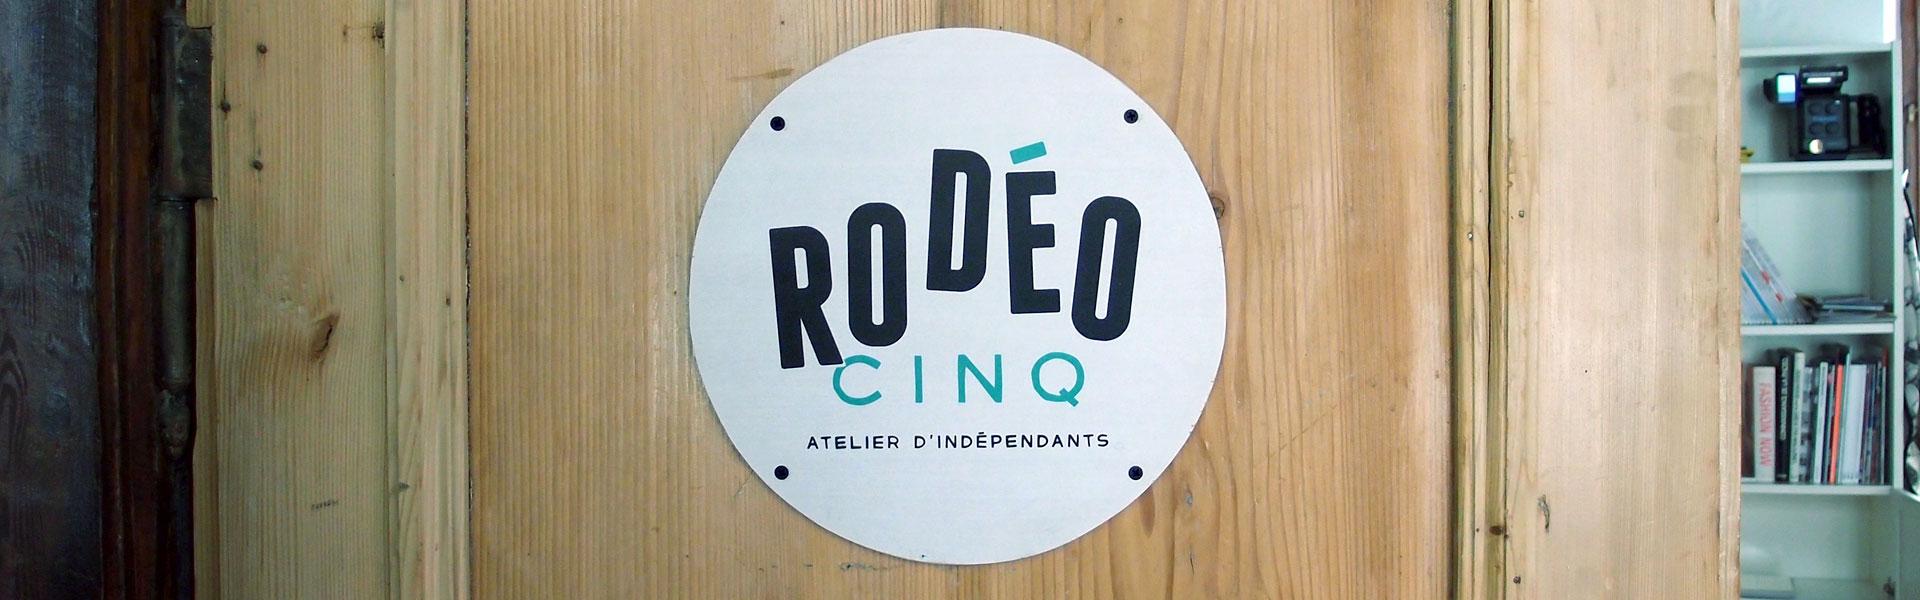 slide-rodeocinq2